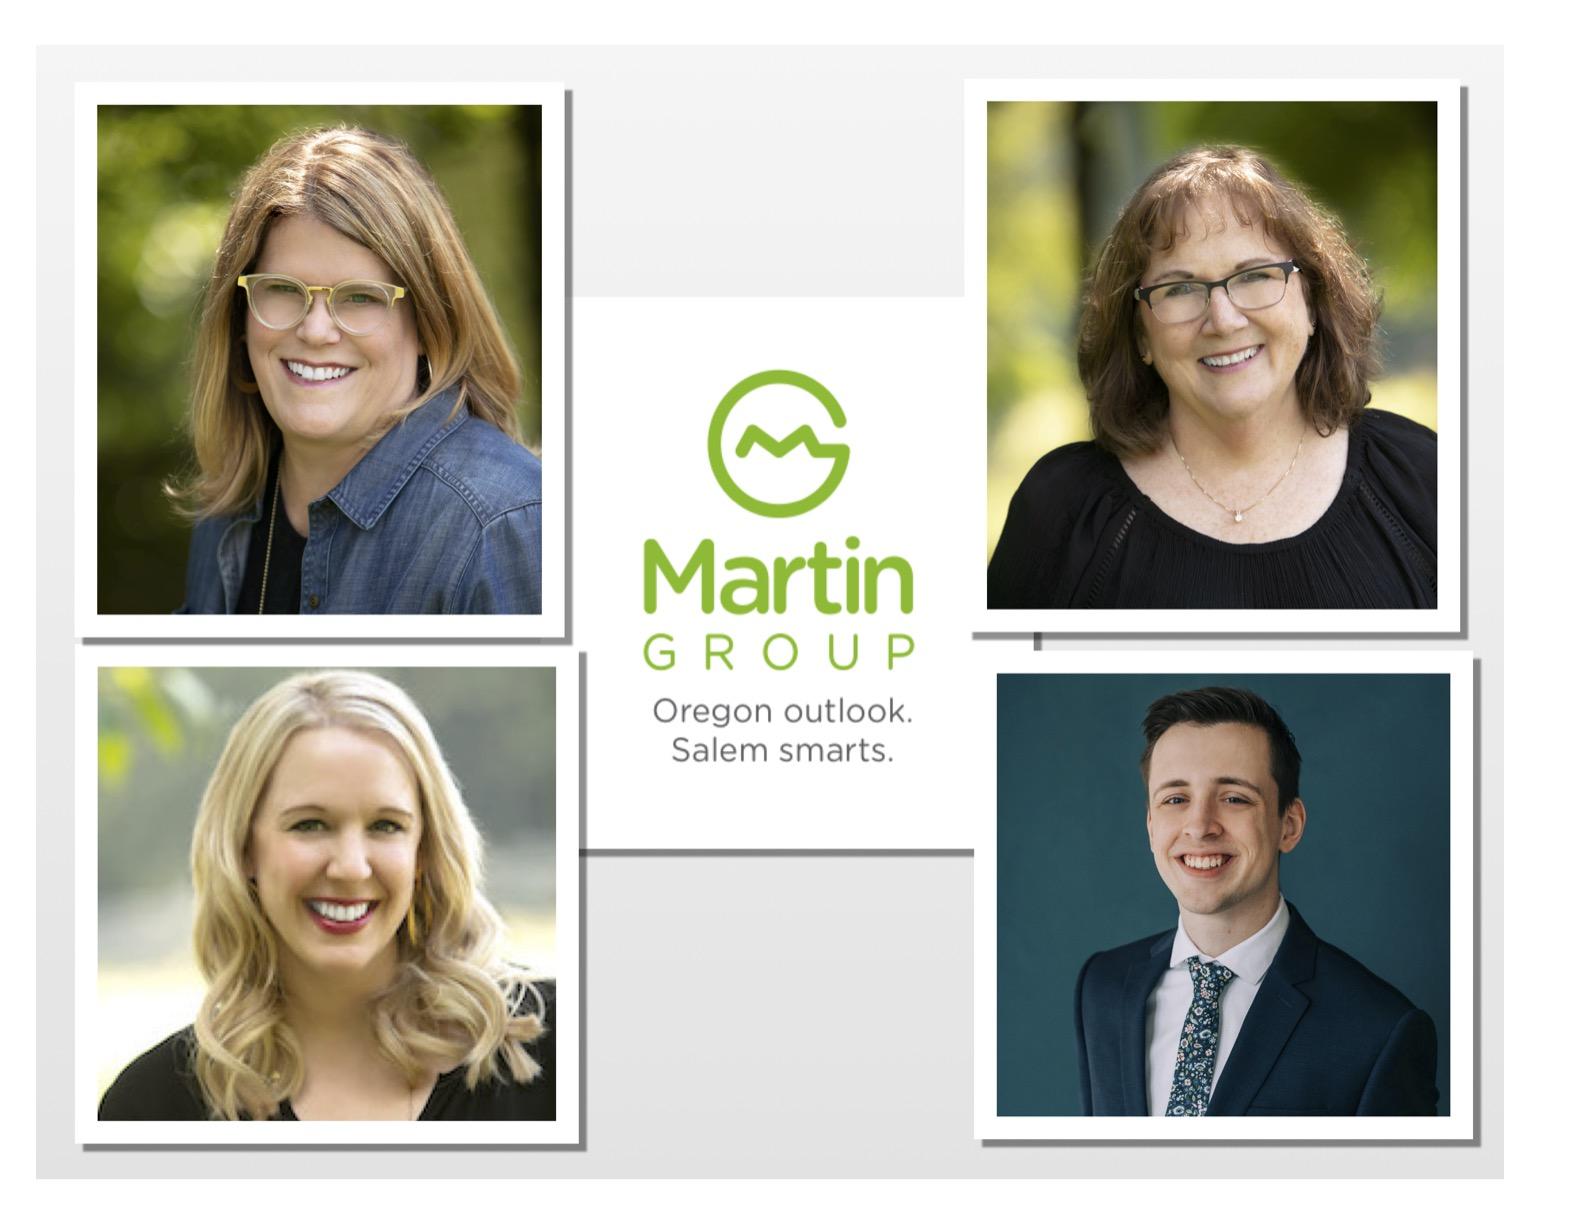 Oregon Martin Group